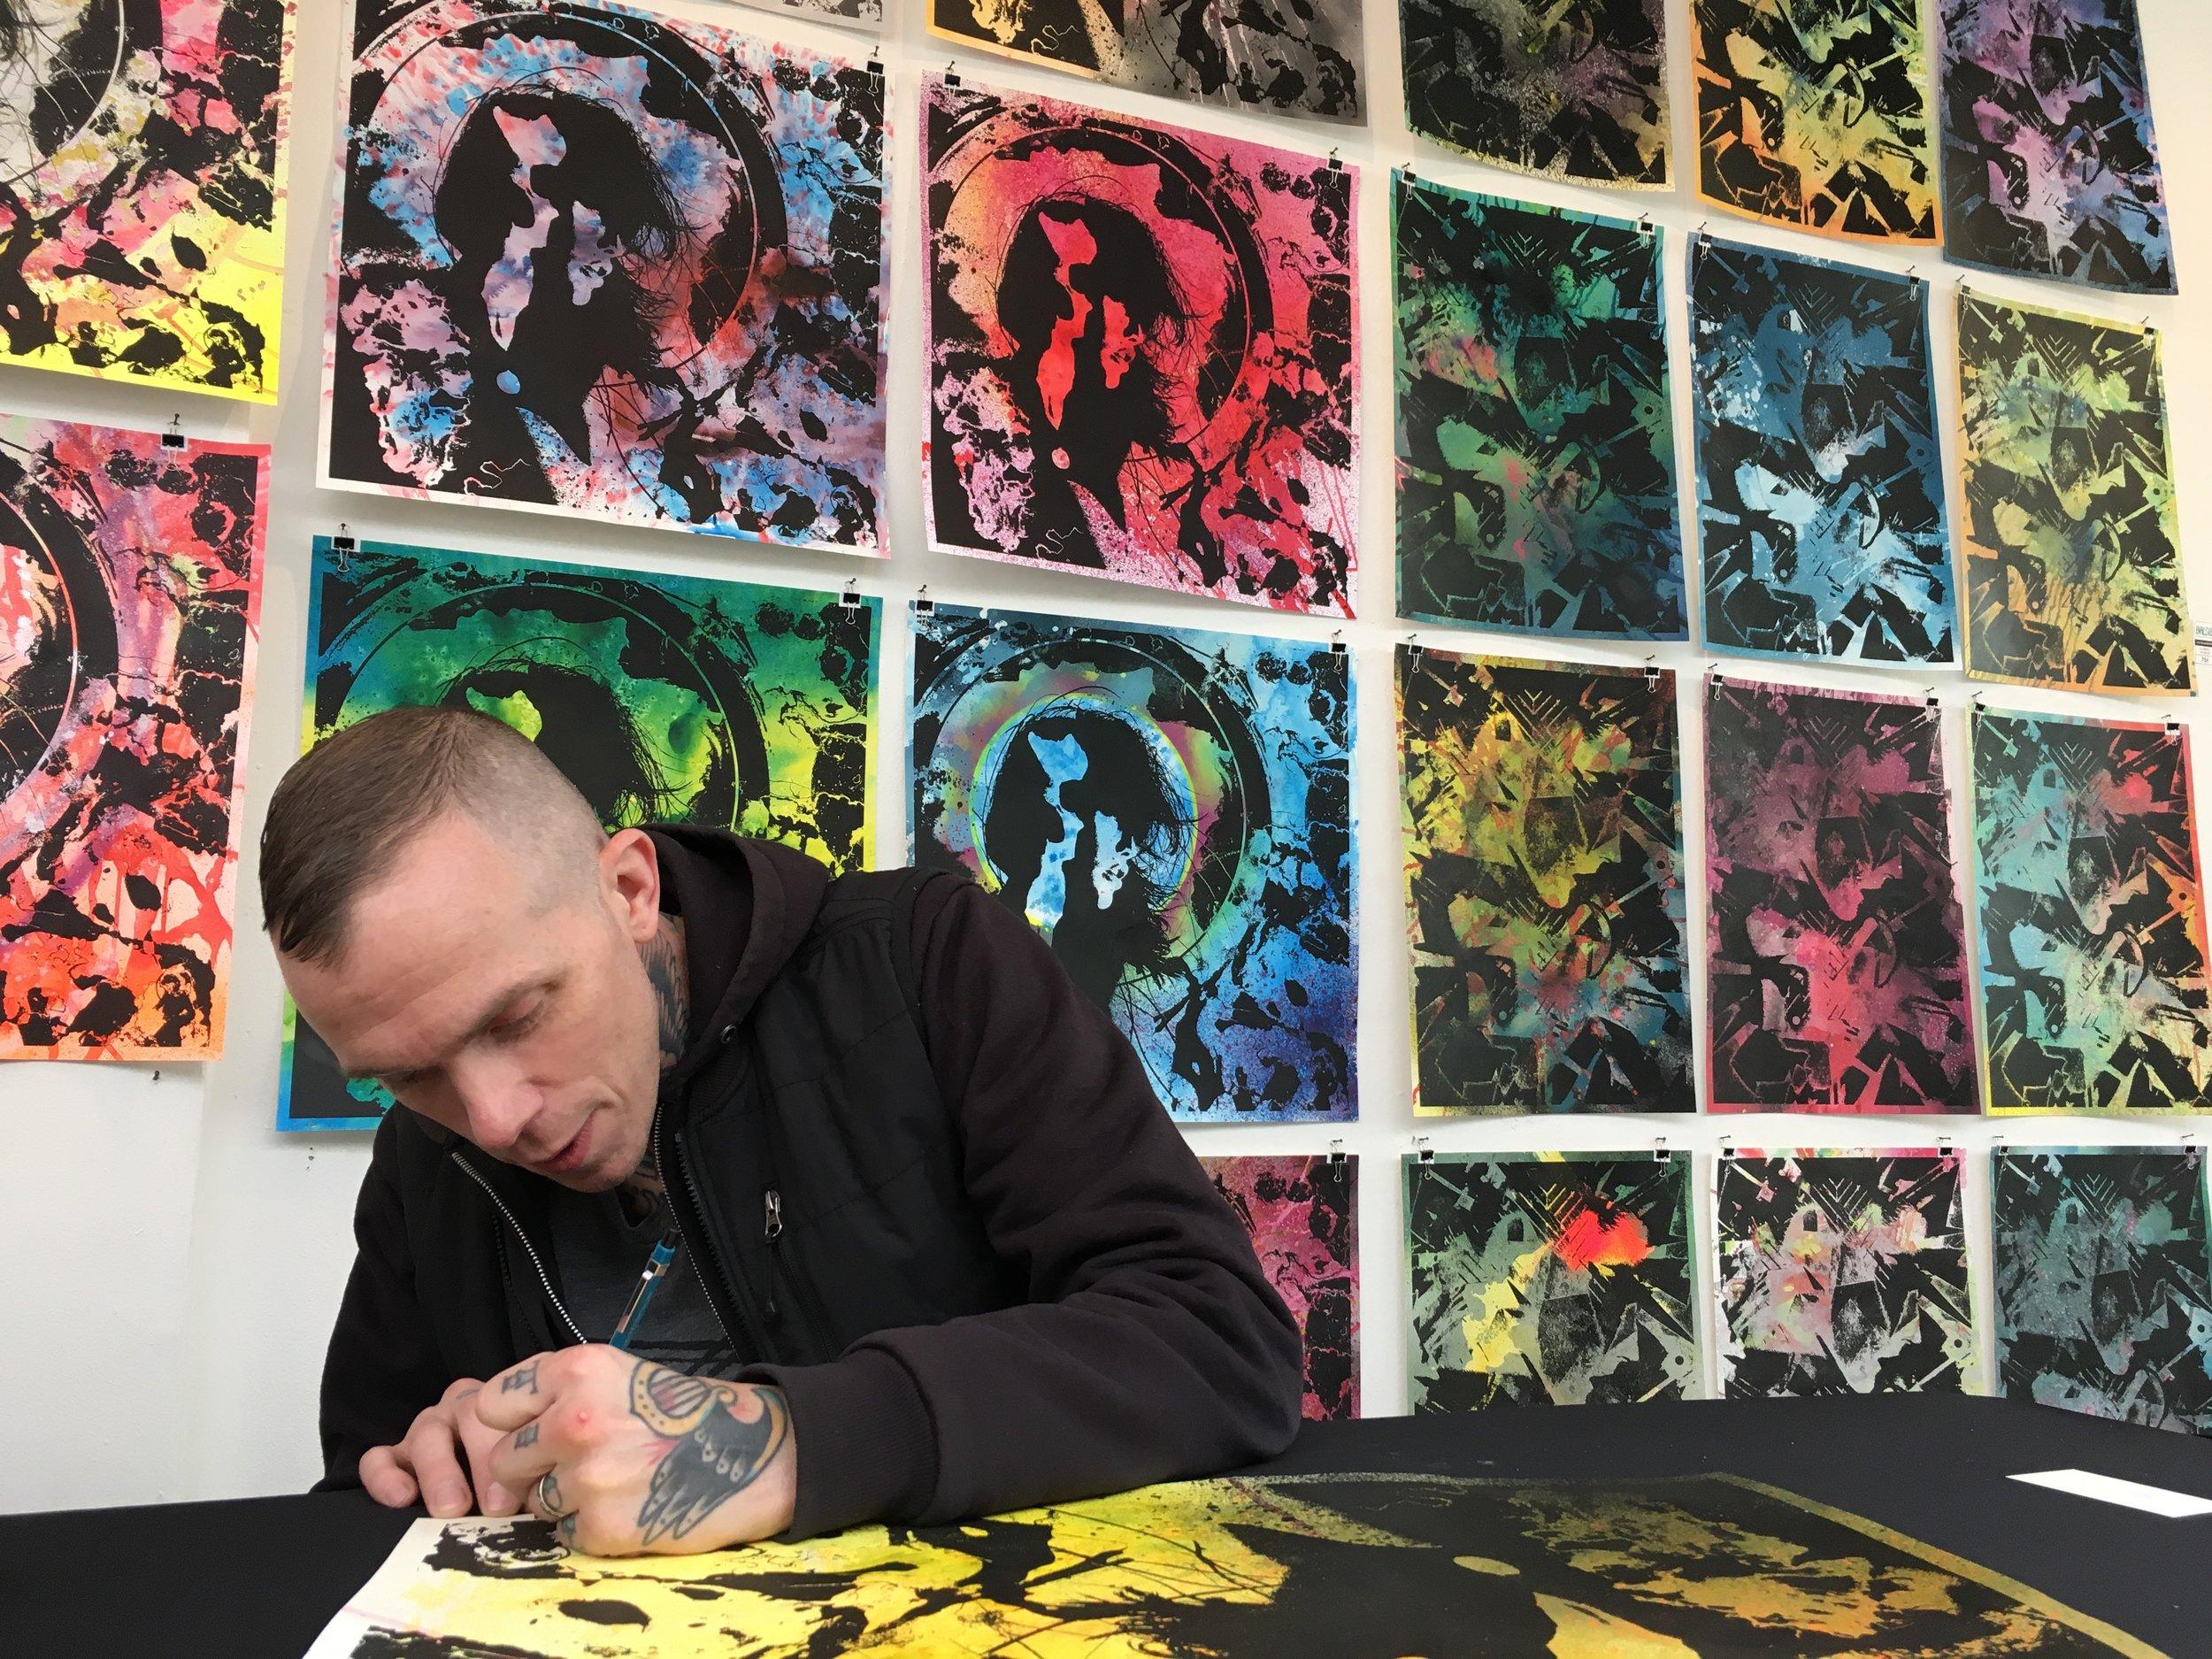 Jacob Bannon - roadburn 2018 curatormassachusetts, USA